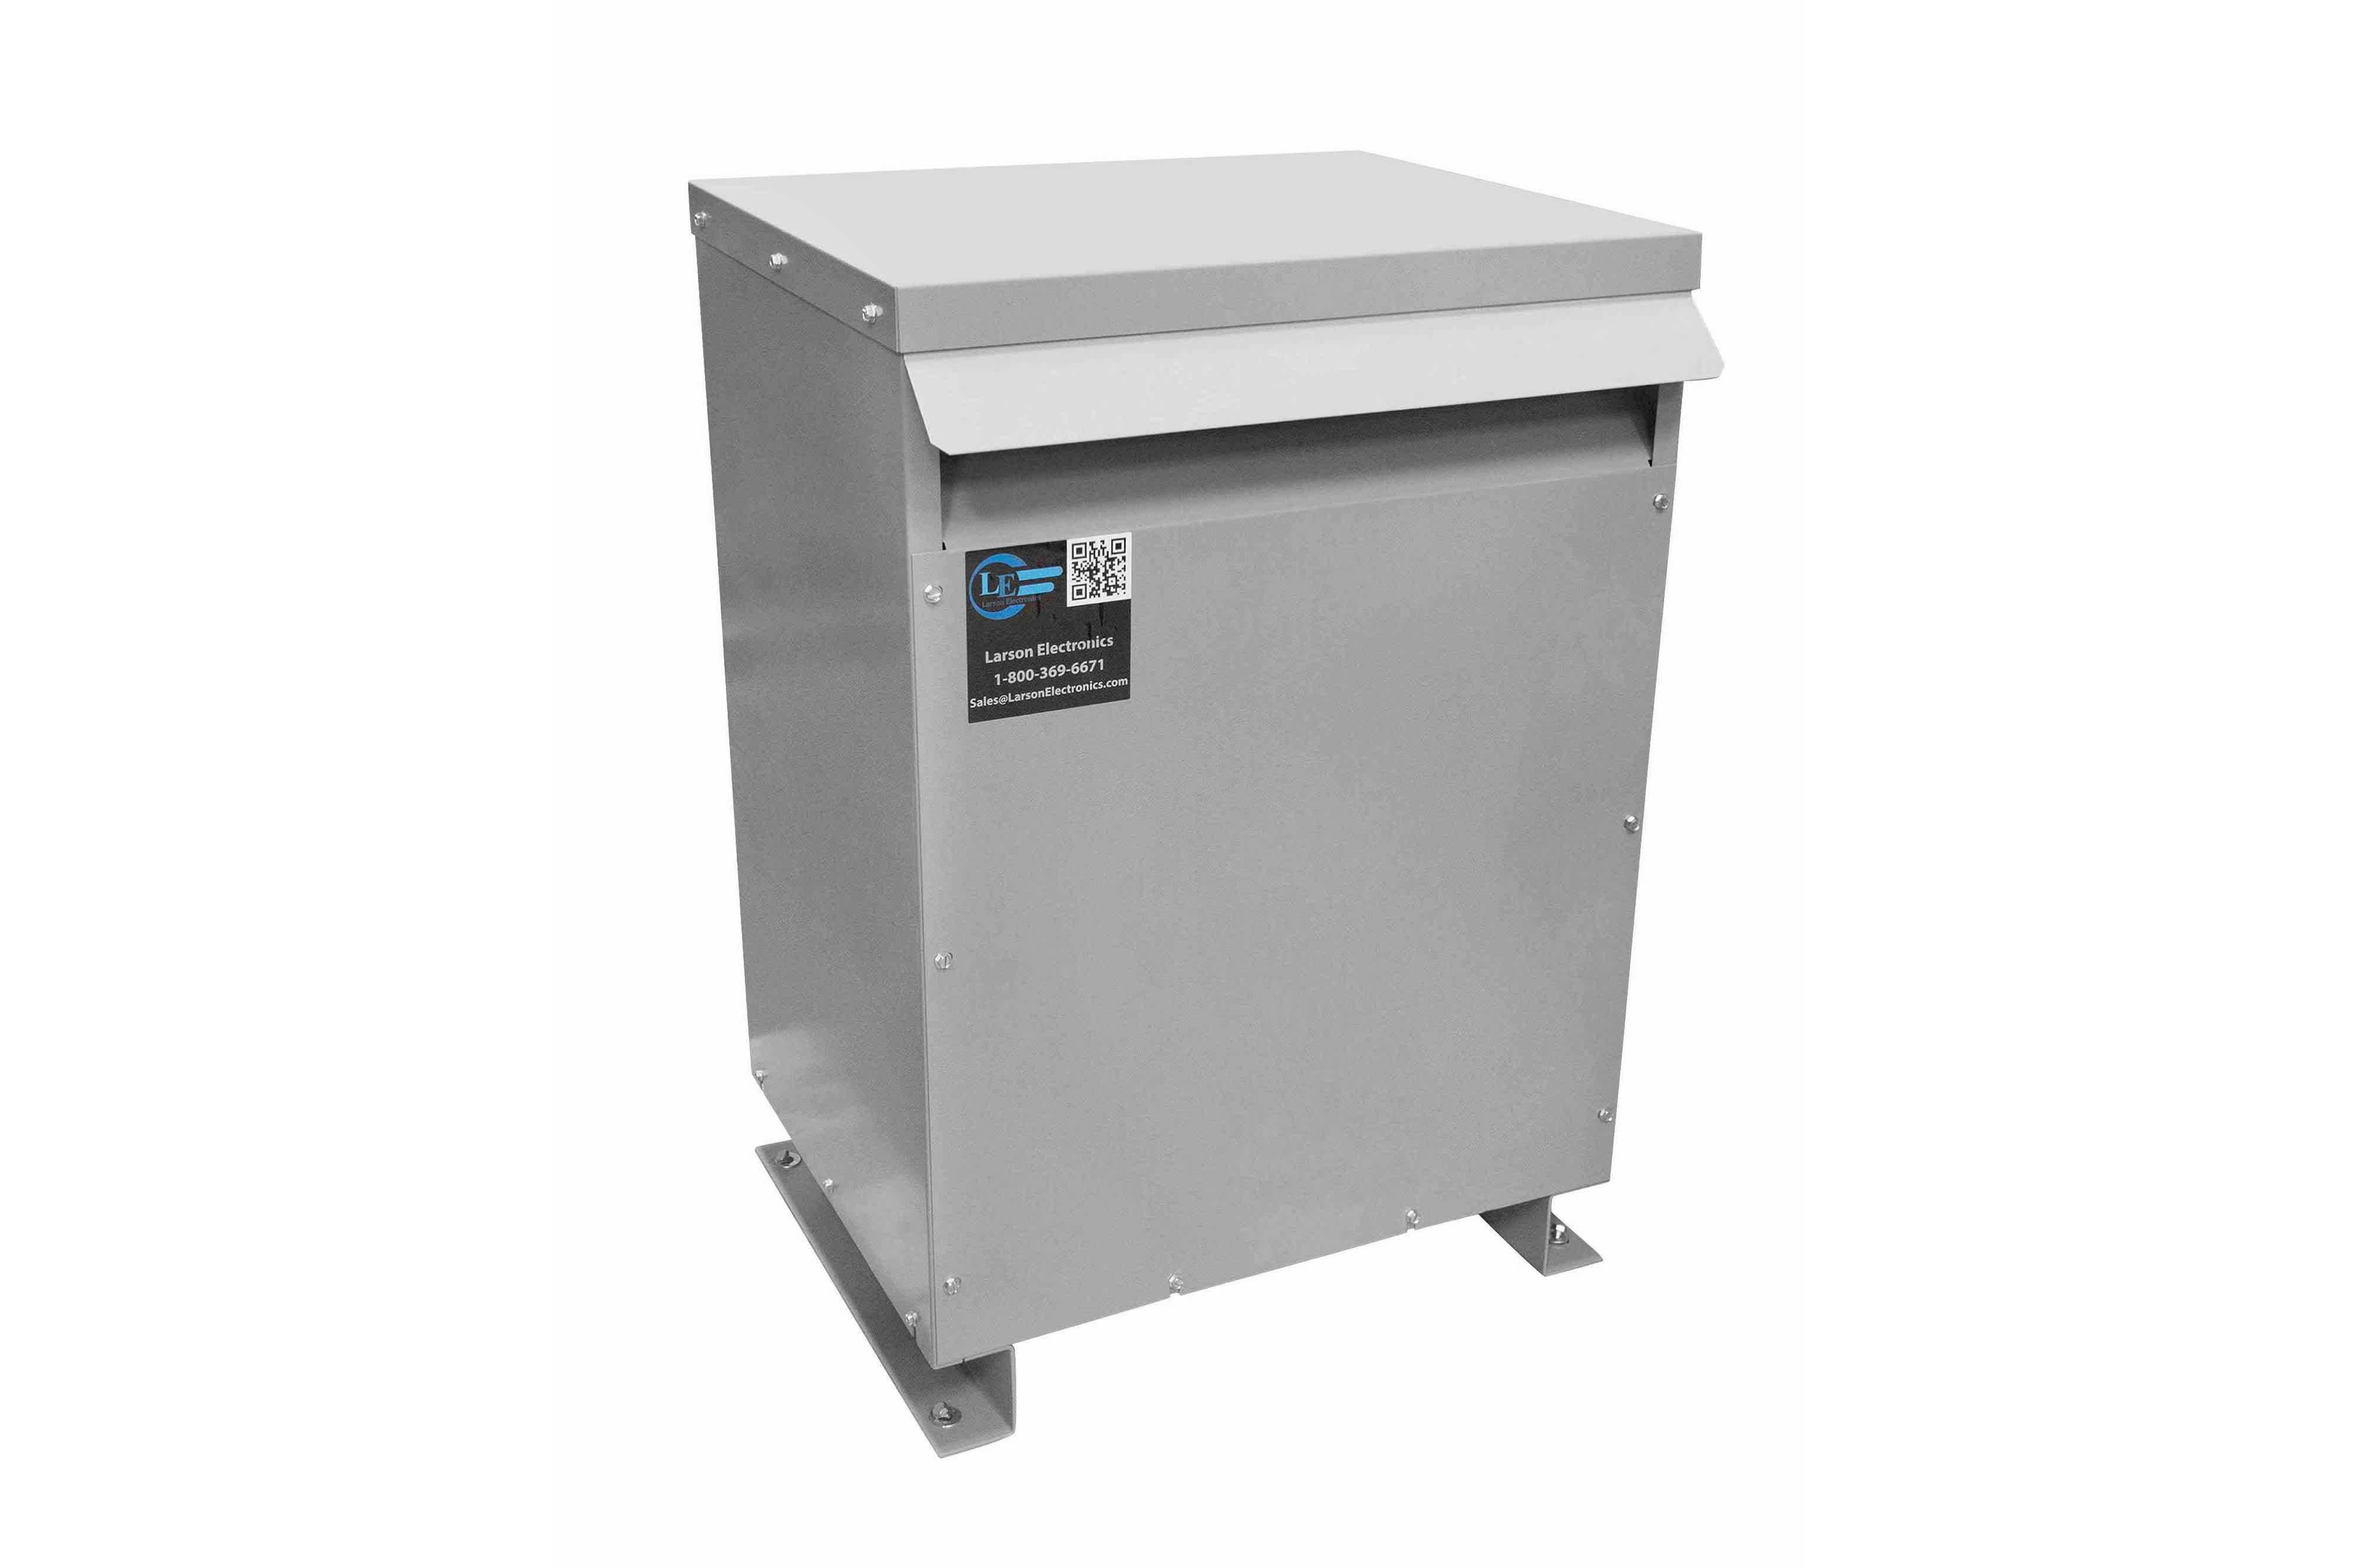 32.5 kVA 3PH Isolation Transformer, 415V Wye Primary, 240V/120 Delta Secondary, N3R, Ventilated, 60 Hz